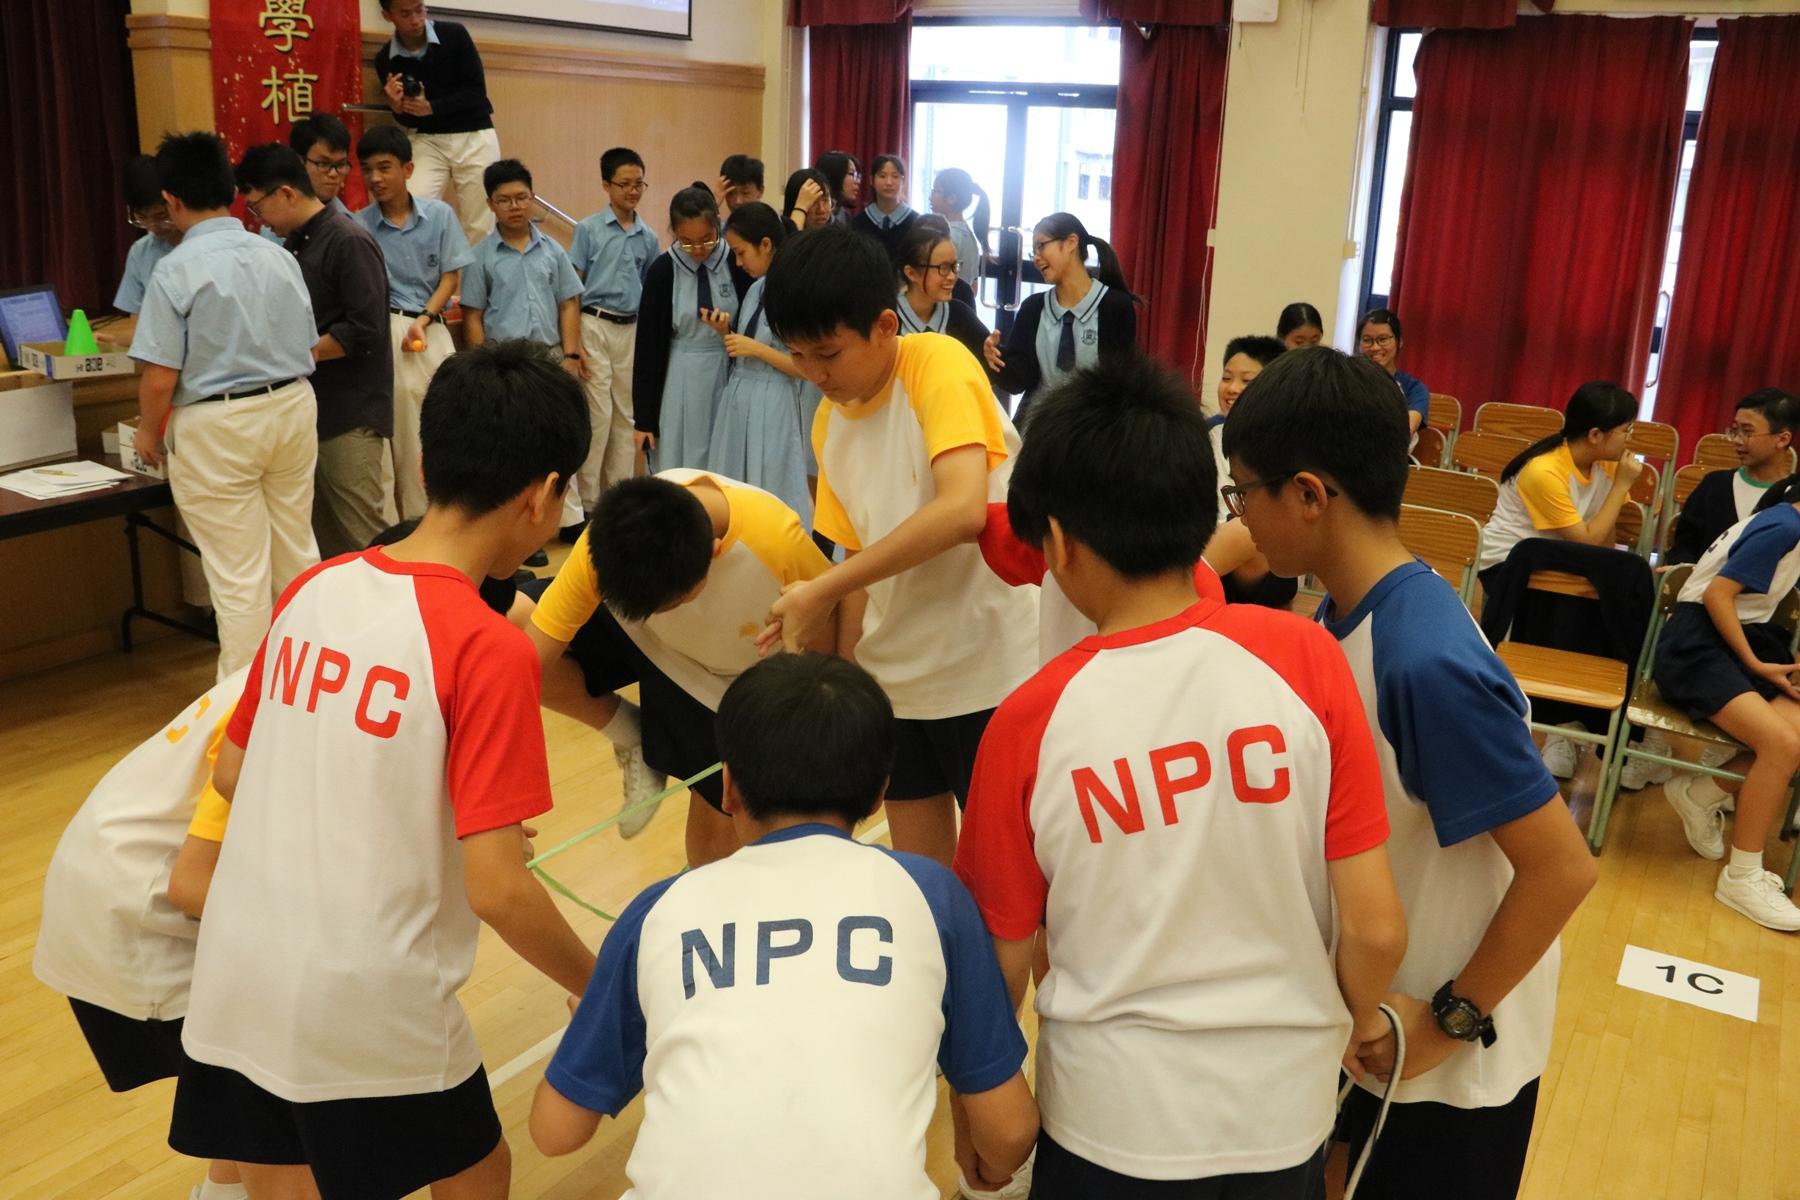 http://npc.edu.hk/sites/default/files/img_6423_1.jpg